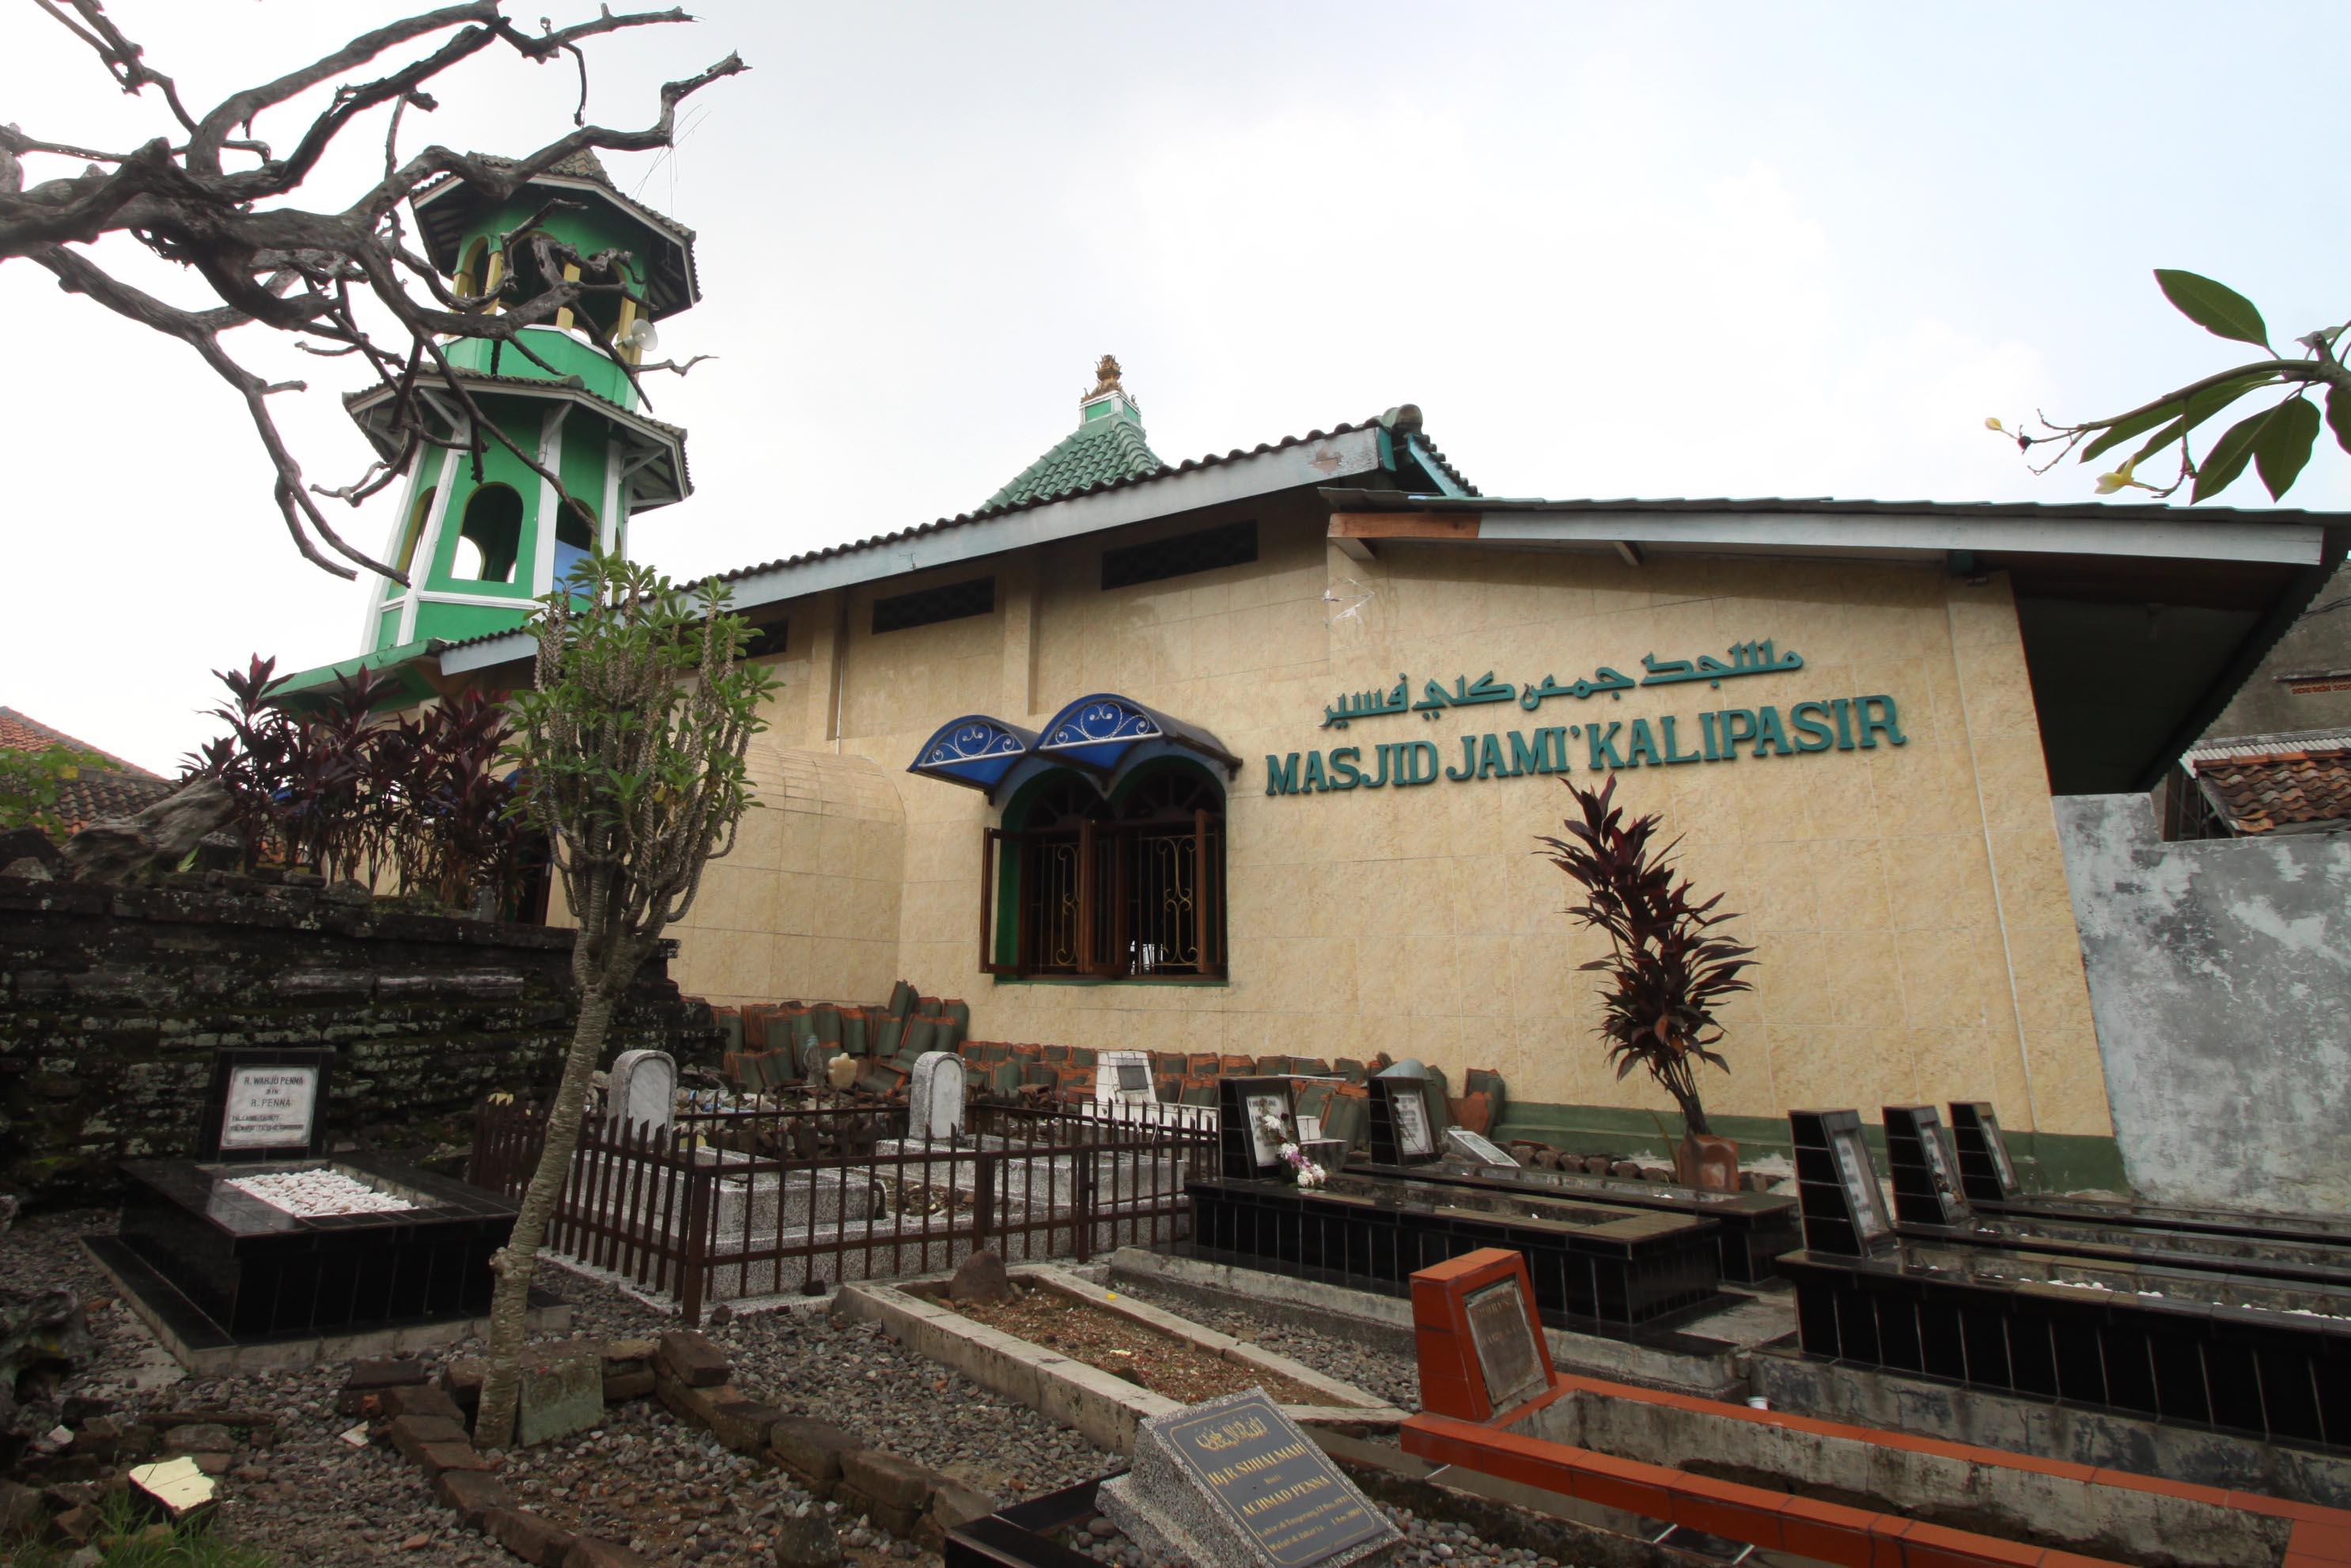 Menara Masjid Tangerang, Check Out Menara Masjid Tangerang ...